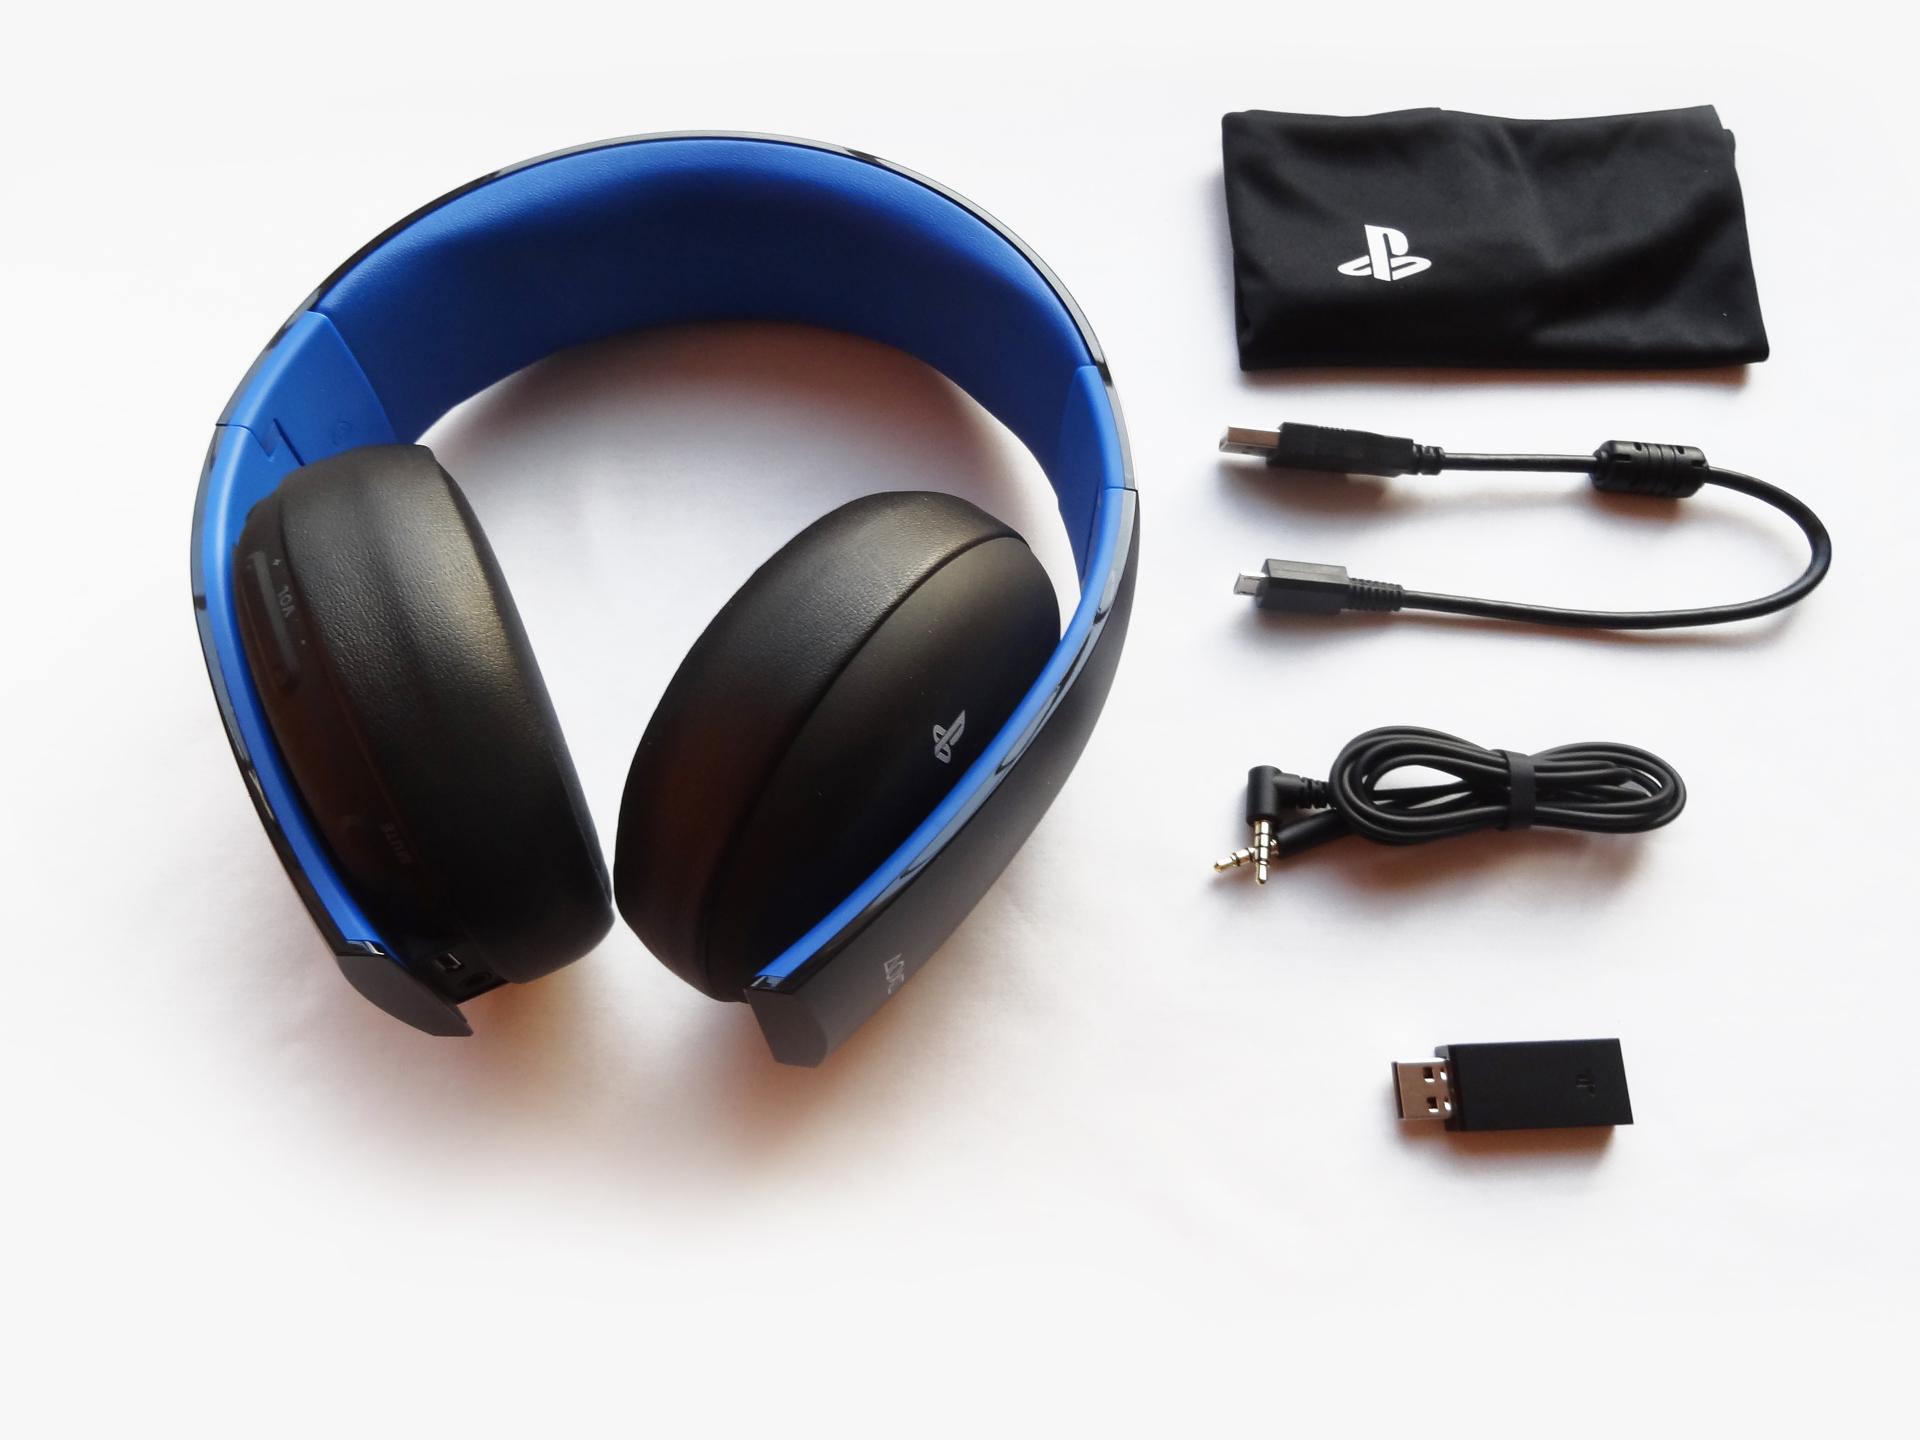 Hardware: Sony Gold Wireless Stereo Headset 9452